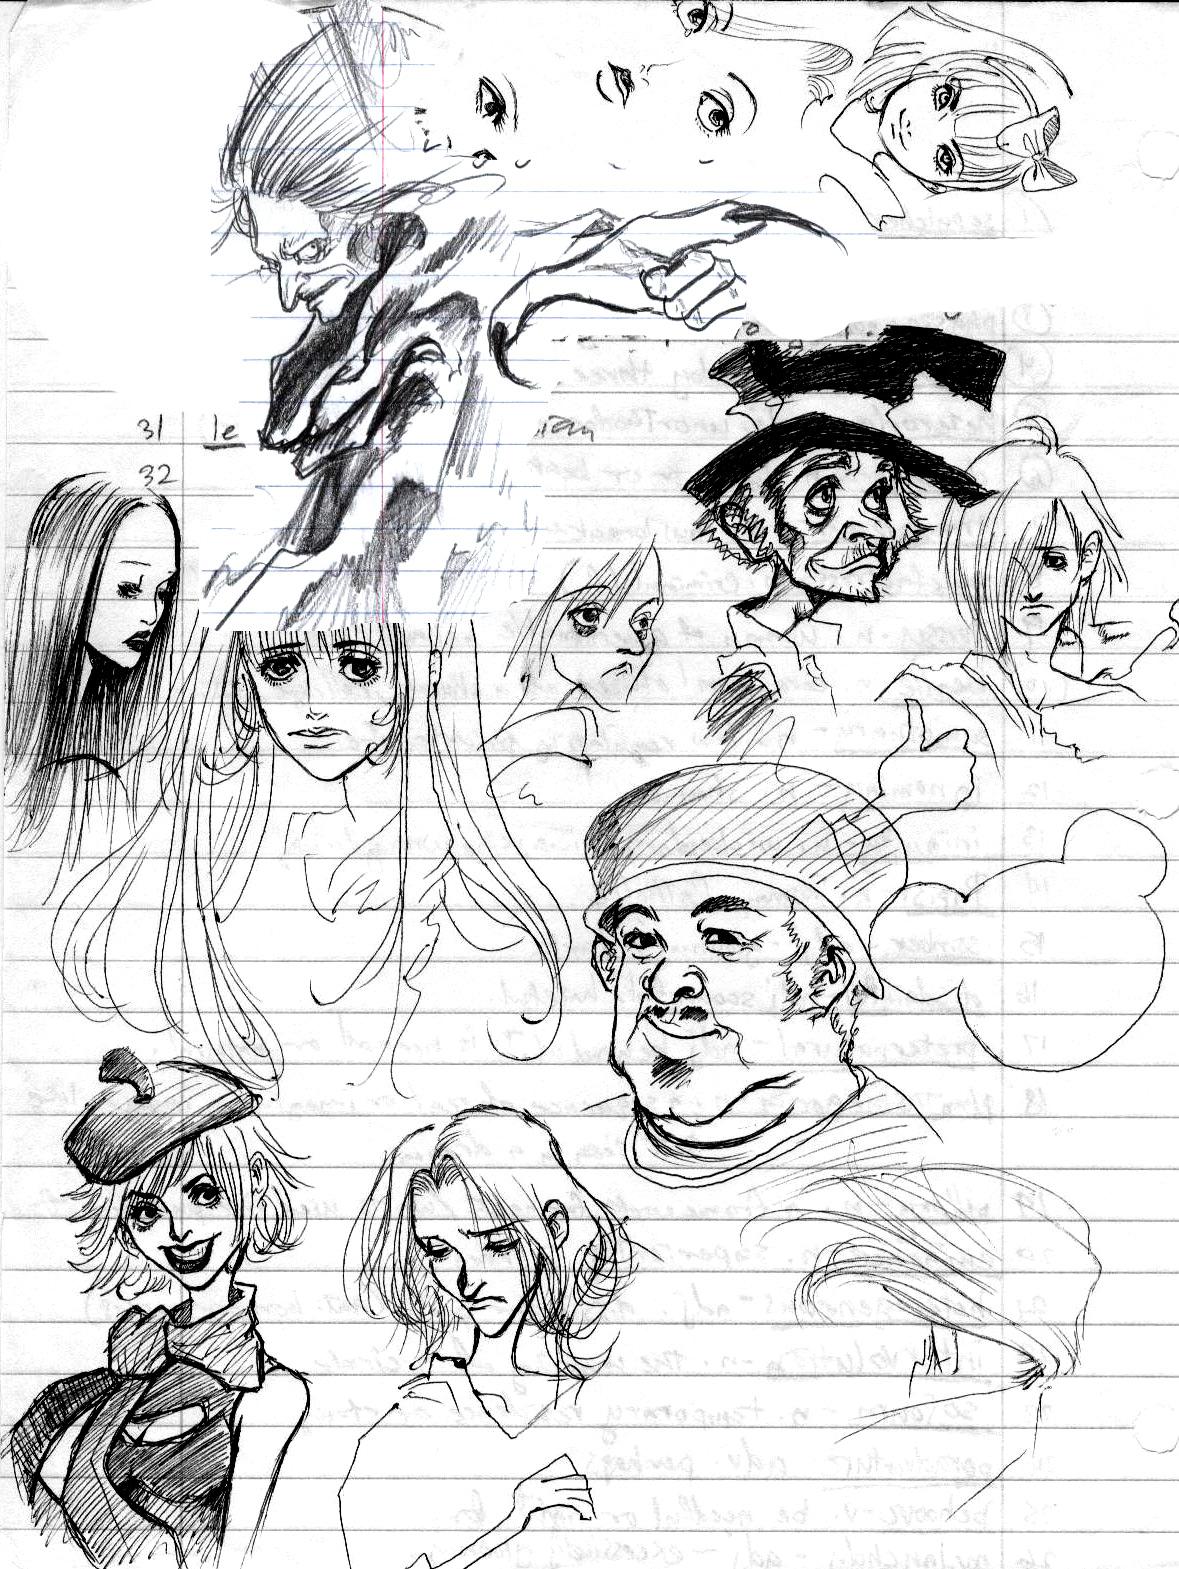 sketches005.jpg